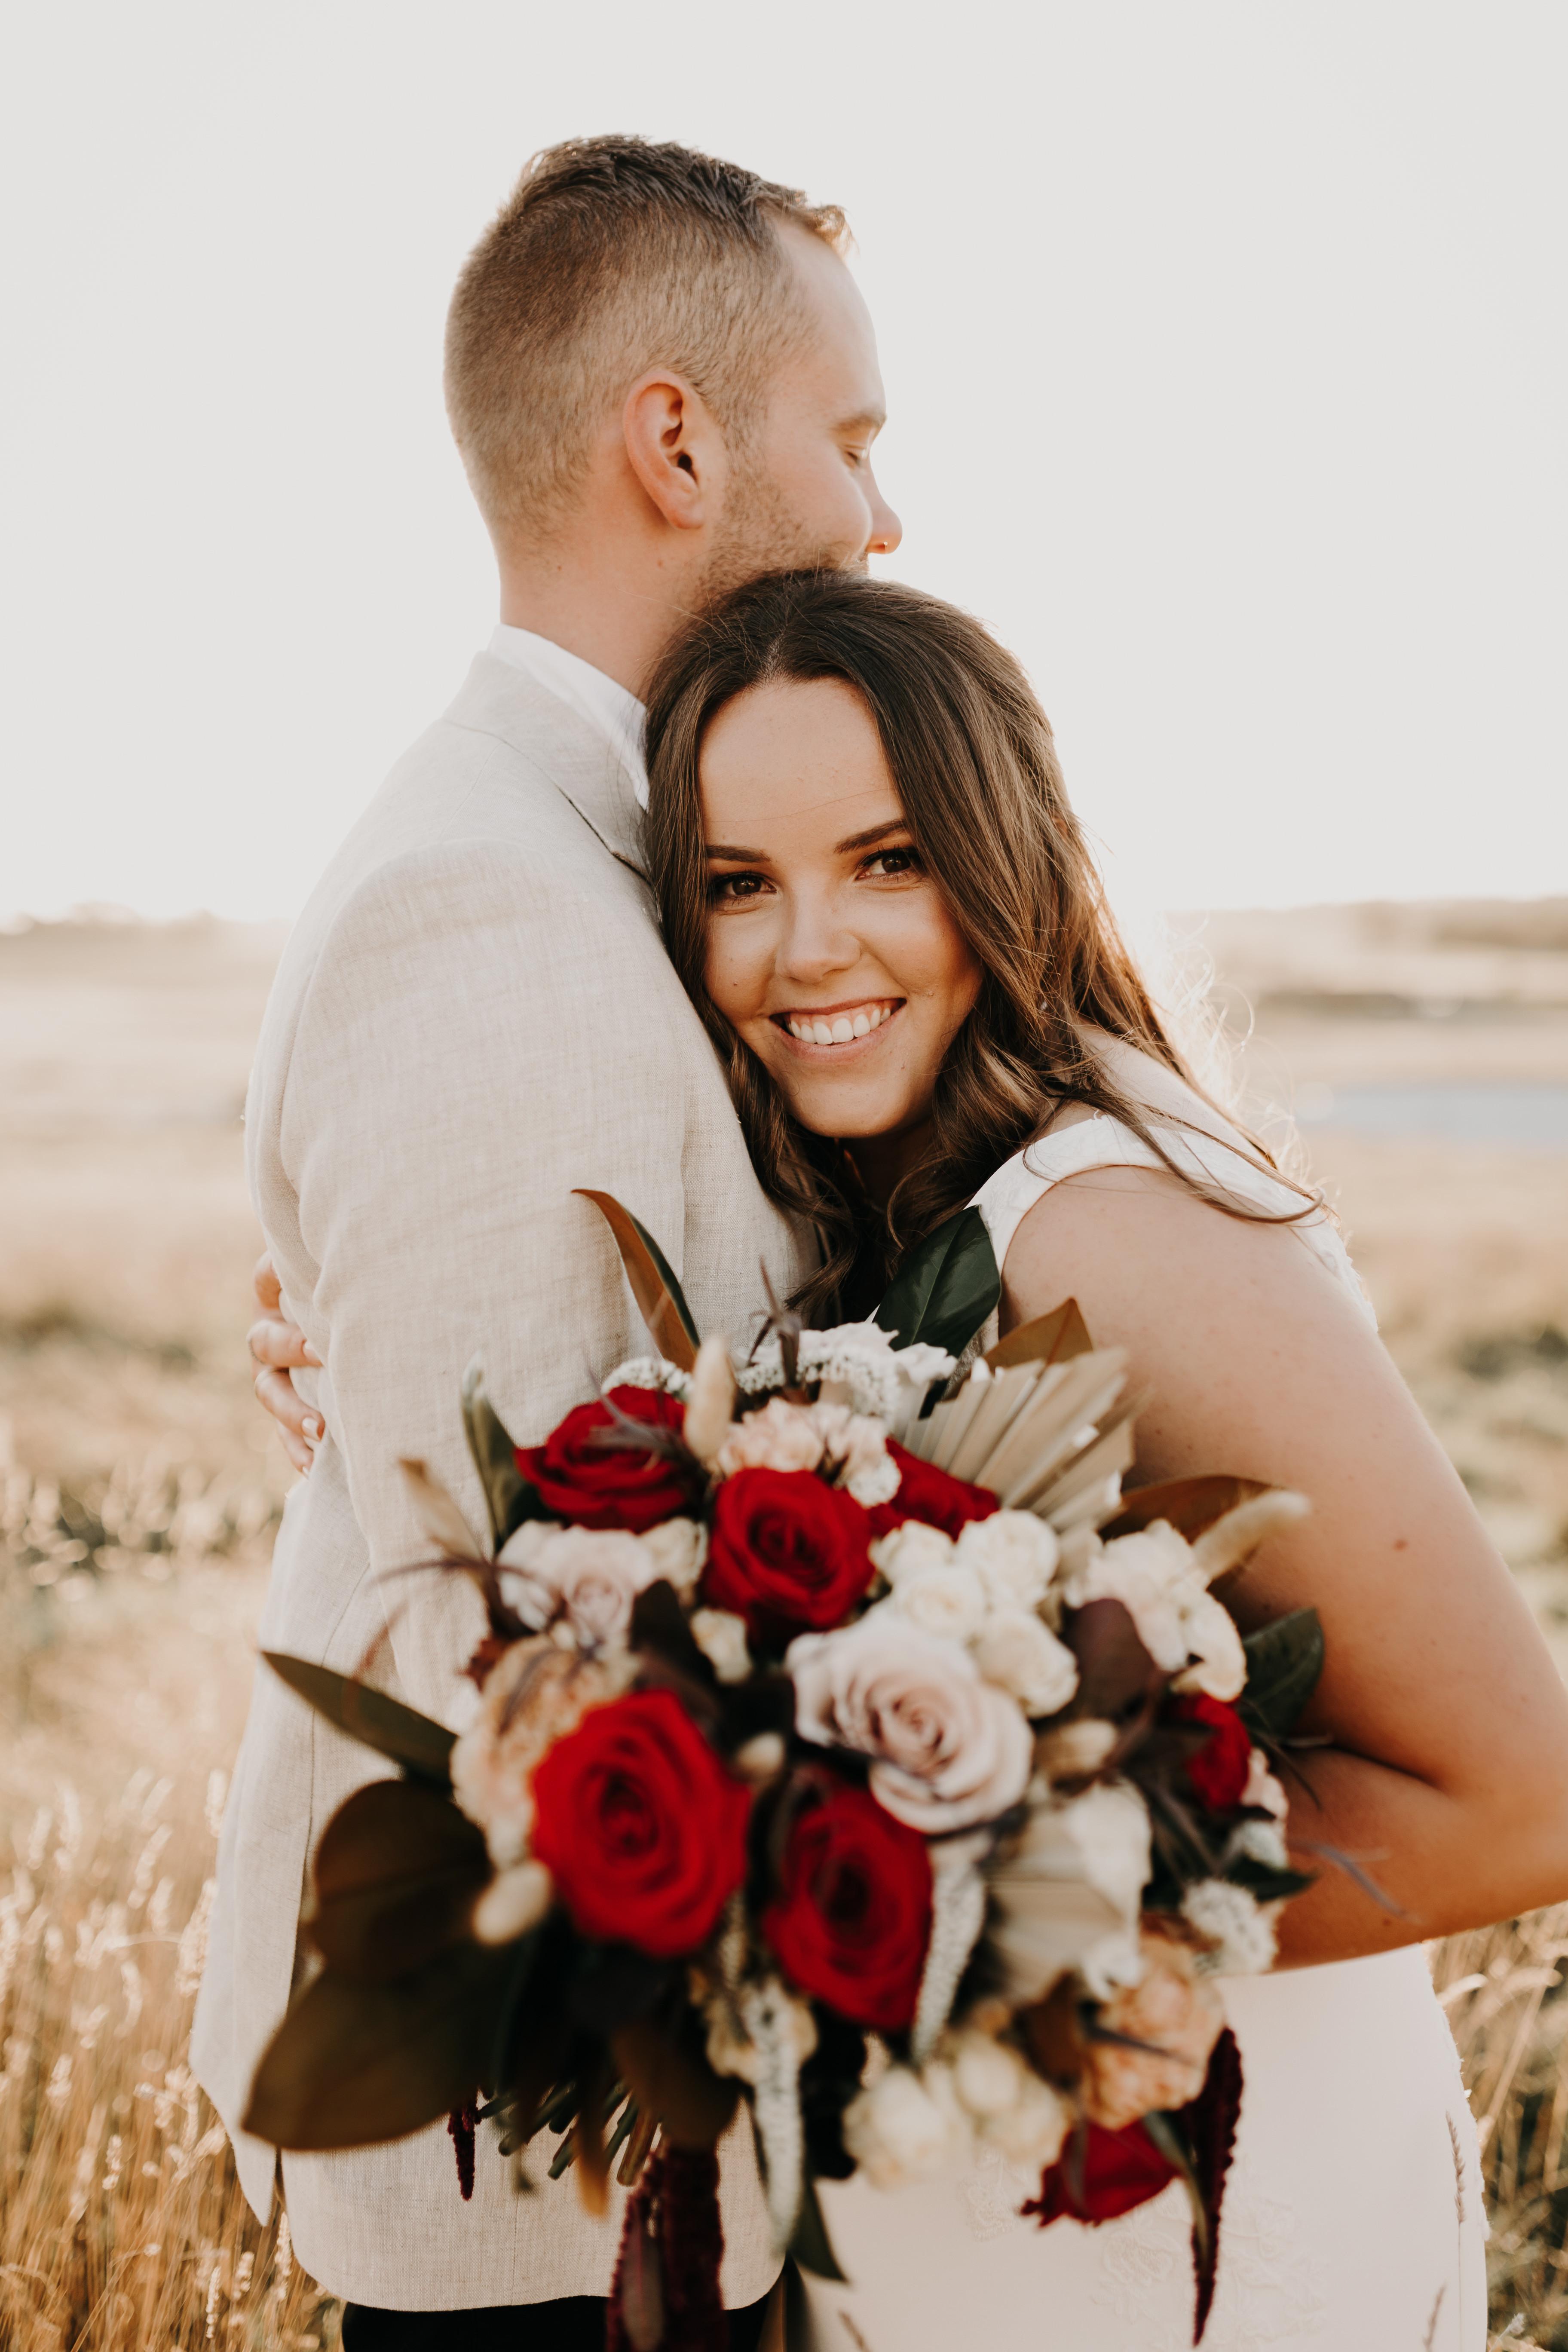 WEDDING PHOTOGRAPHY & VIDEOGPRAHY